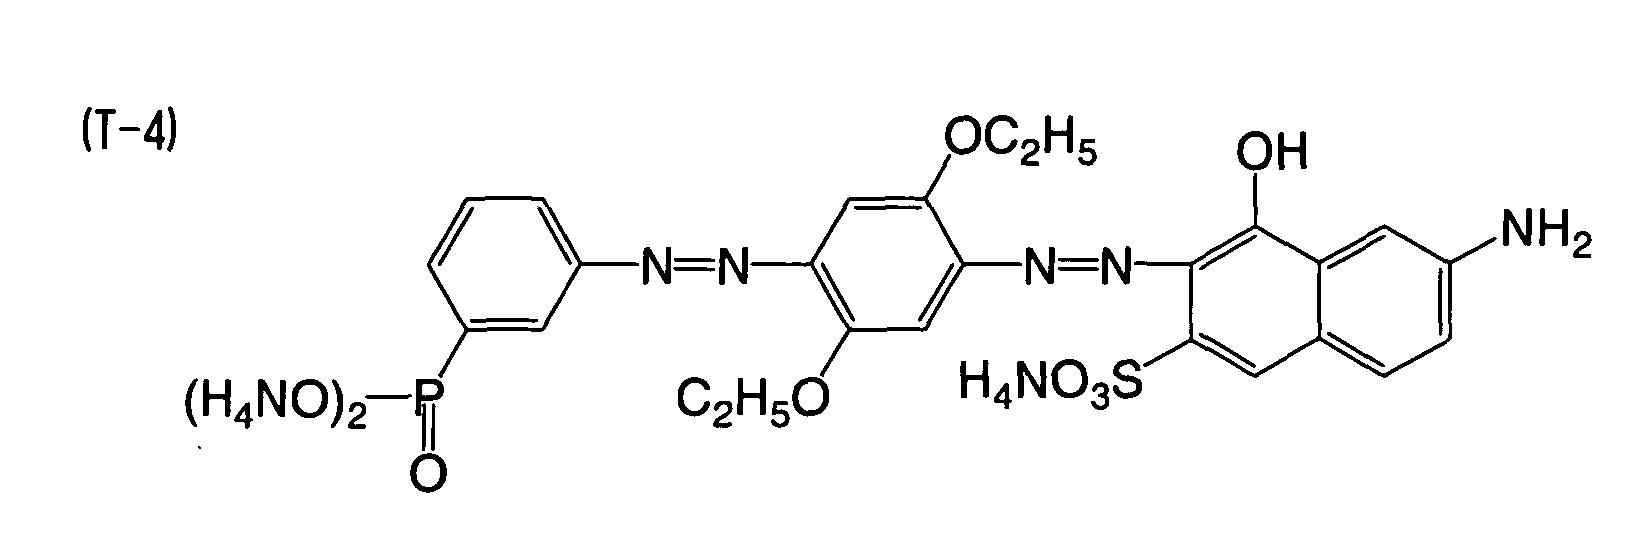 Figure imgb0195